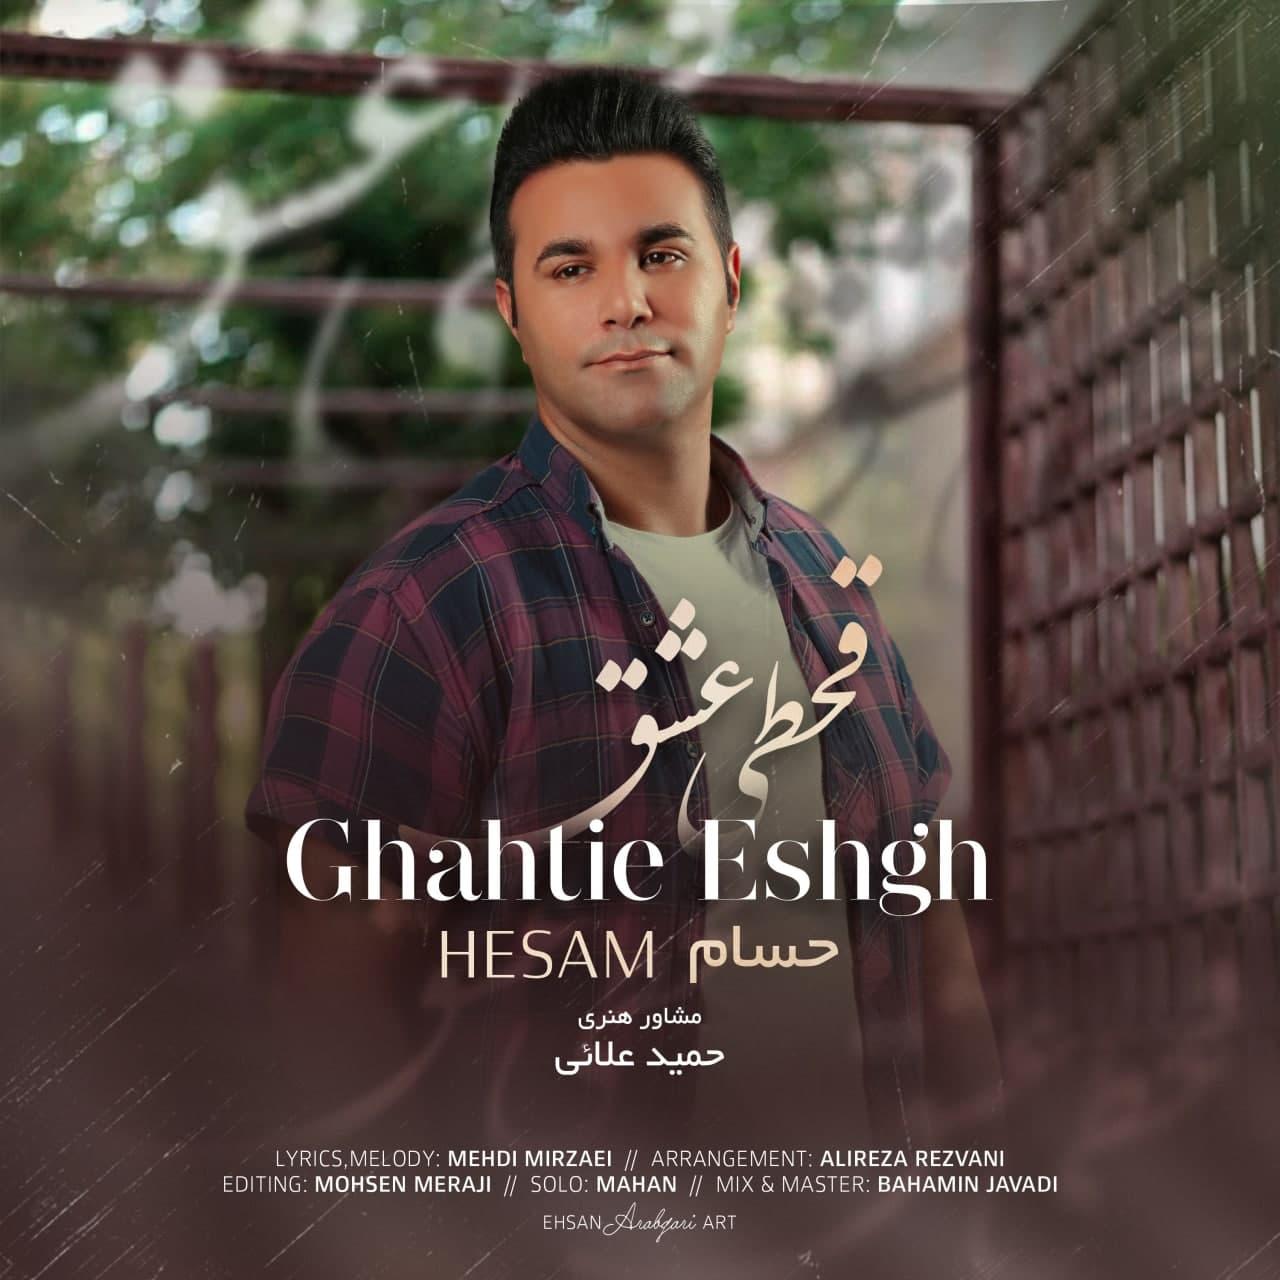 Hesam – Ghahtie Eshgh